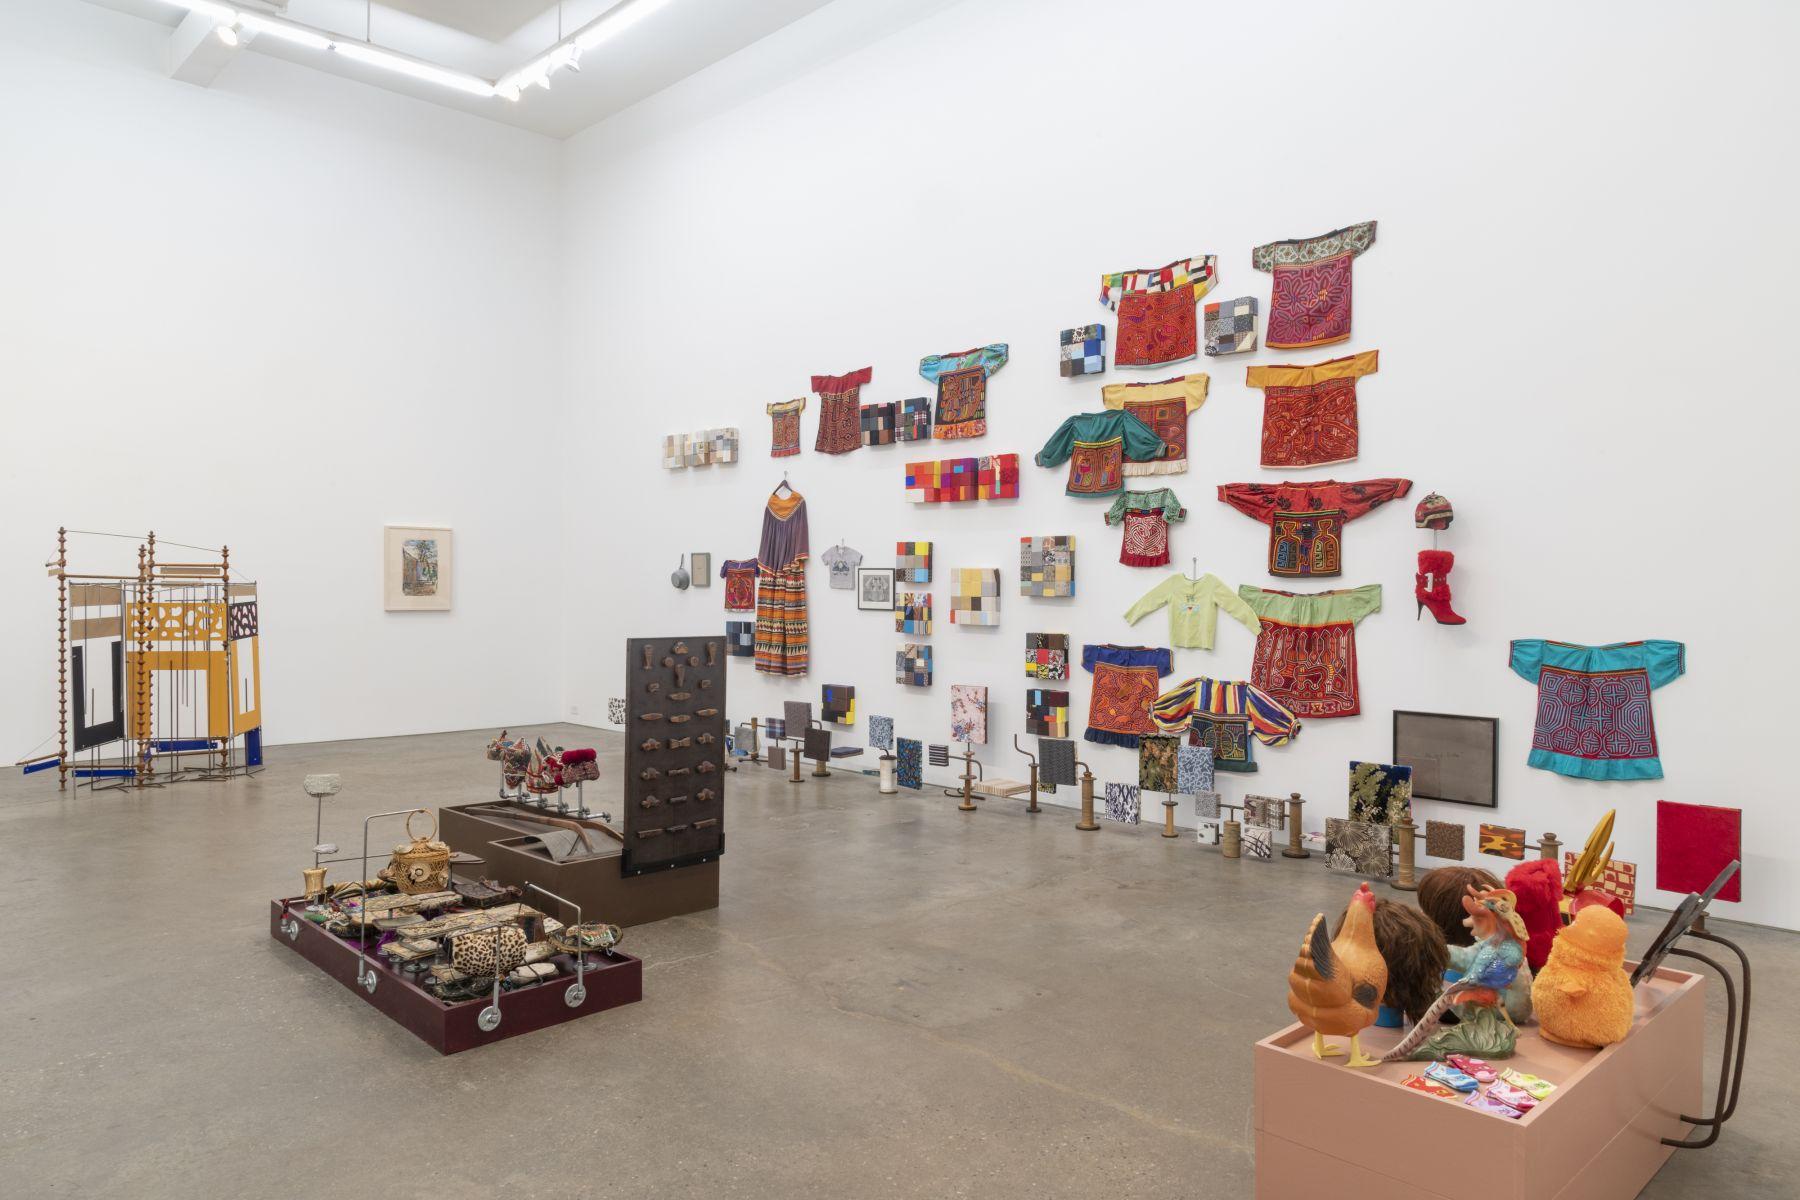 Nancy Shaver, A part of a part of a part, installation view at Derek Eller Gallery, New York